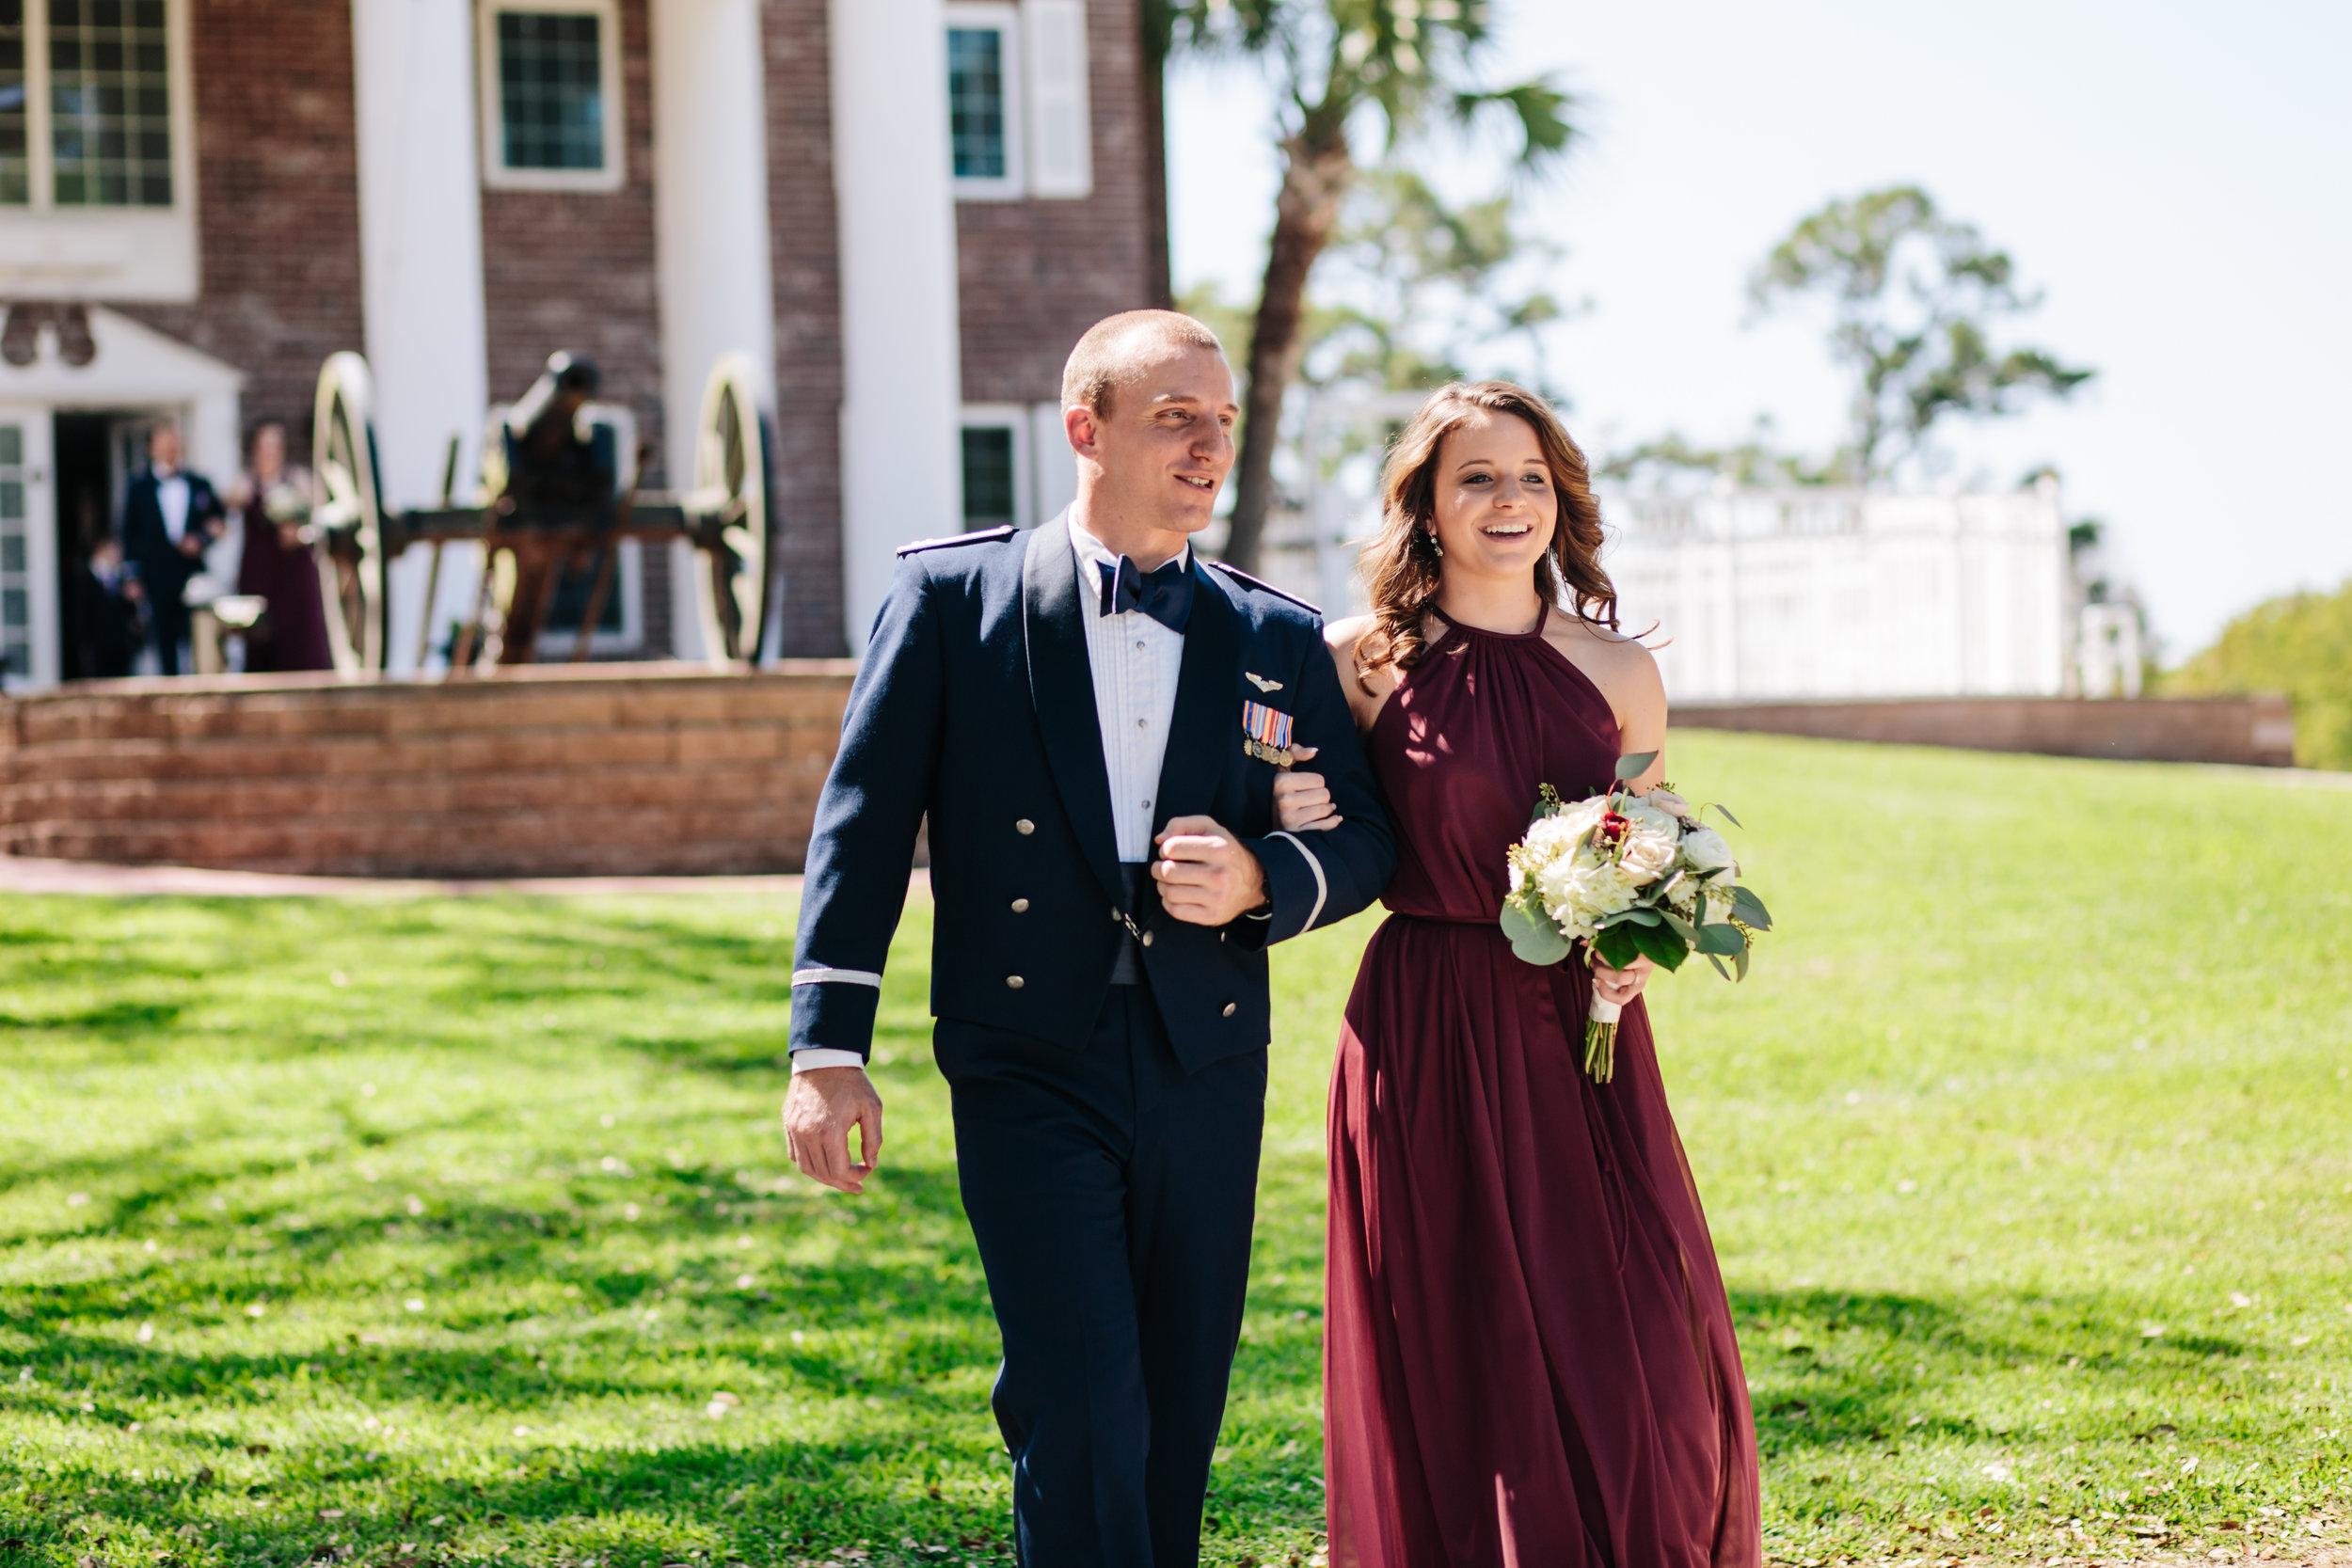 2018.03.17 Allison and Chuck Wedding Waelti Melbourne (218 of 900).jpg